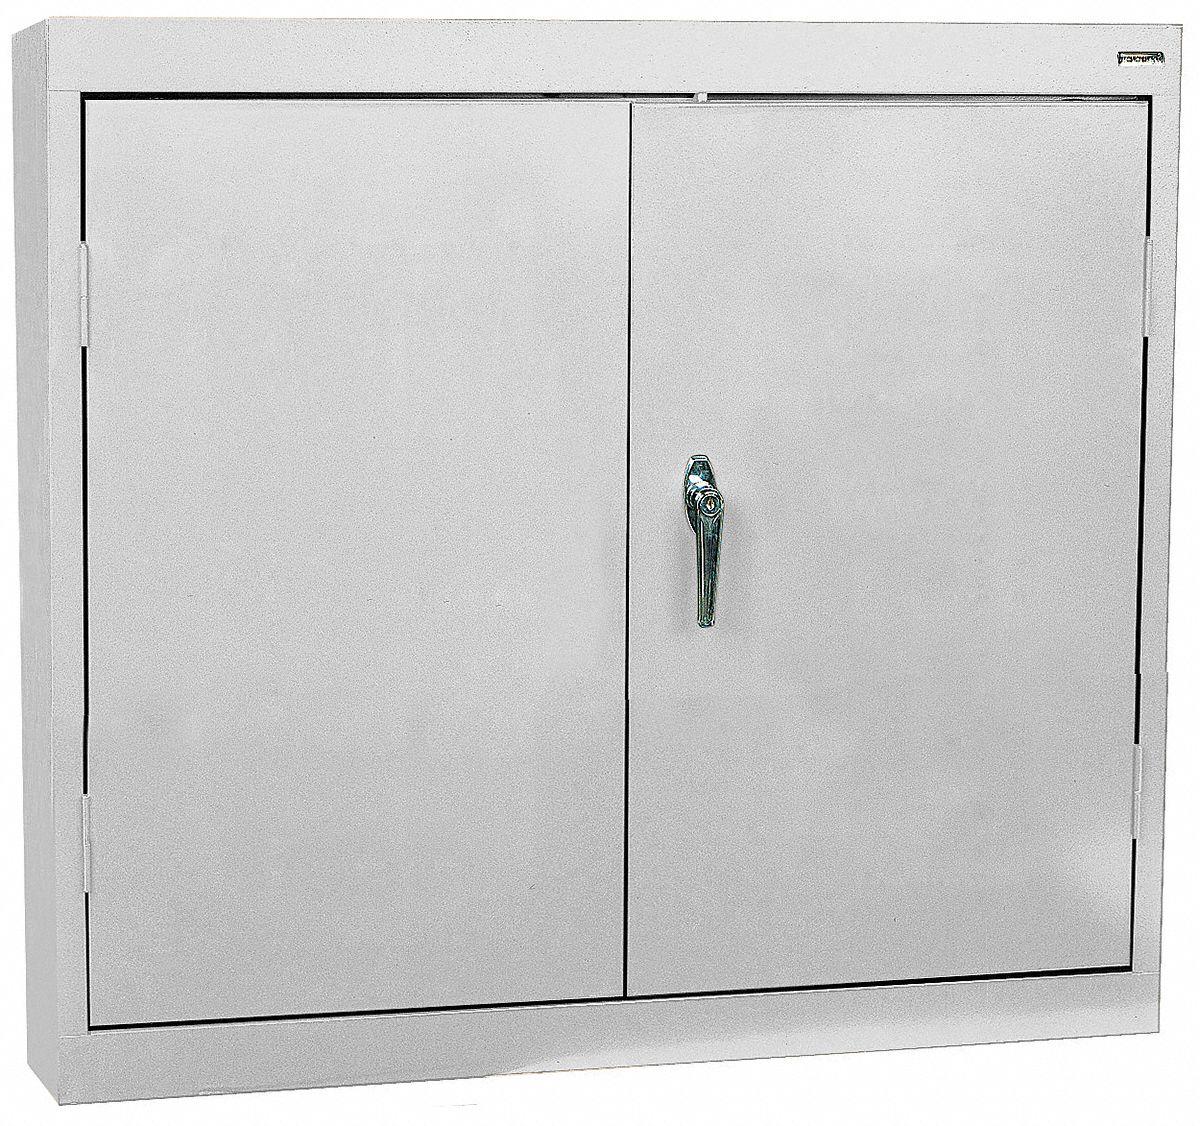 SANDUSKY LEE Dove Gray Wall Mount Storage Cabinet 30 Overall